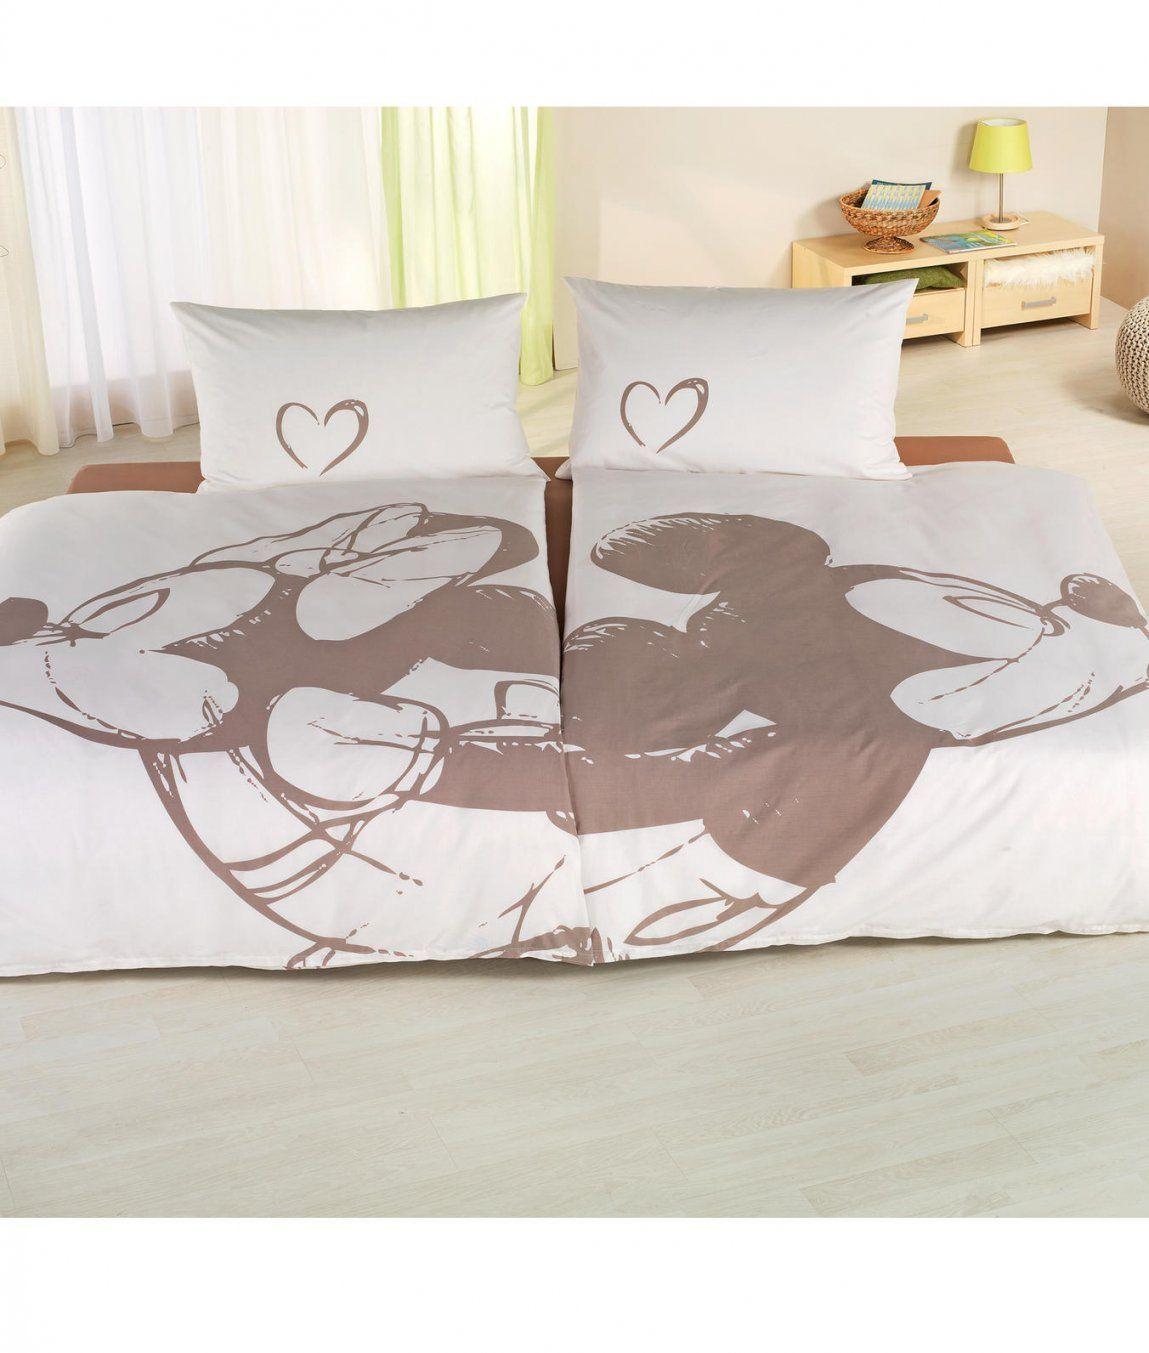 Mickey Mouse Partnerbettwäsche Im 2Erset Kaufen  Angela Bruderer von Mickey Mouse Bettwäsche 200X200 Bild